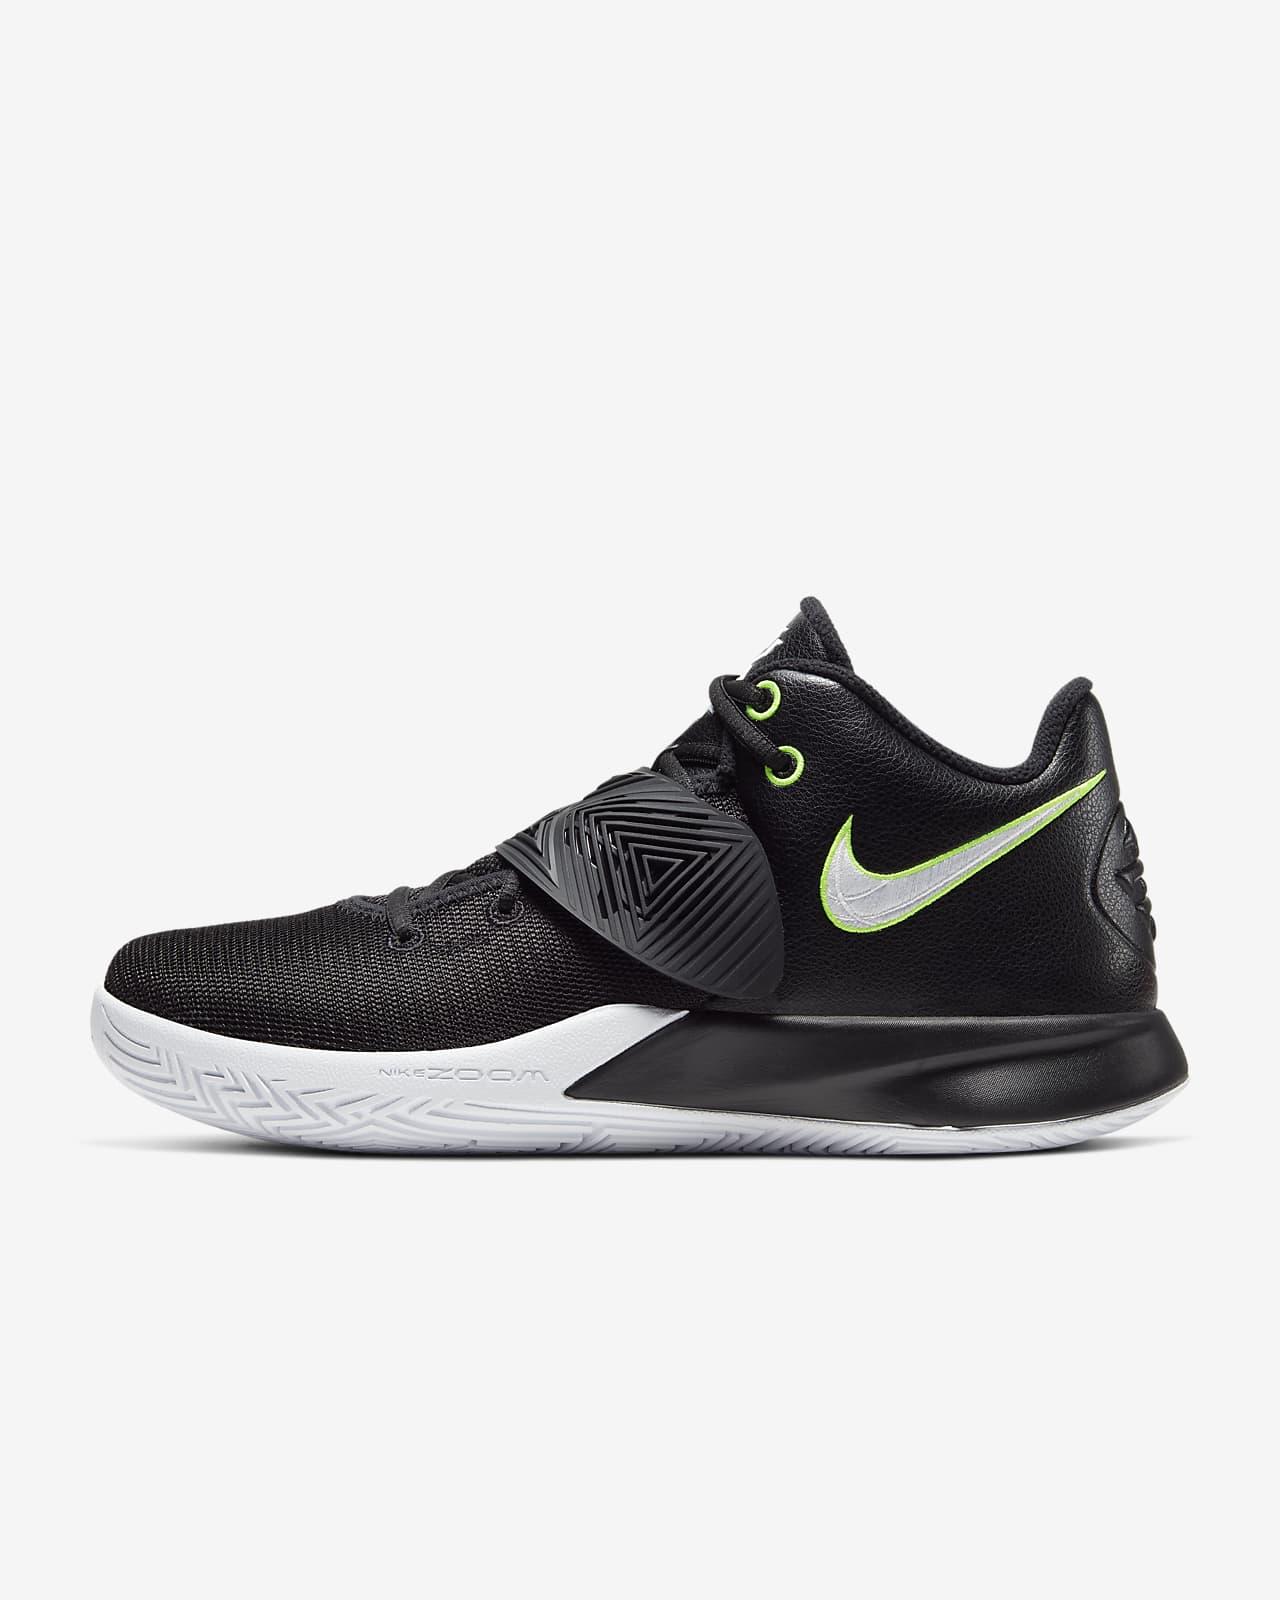 Kyrie Flytrap 3 Basketball Shoe